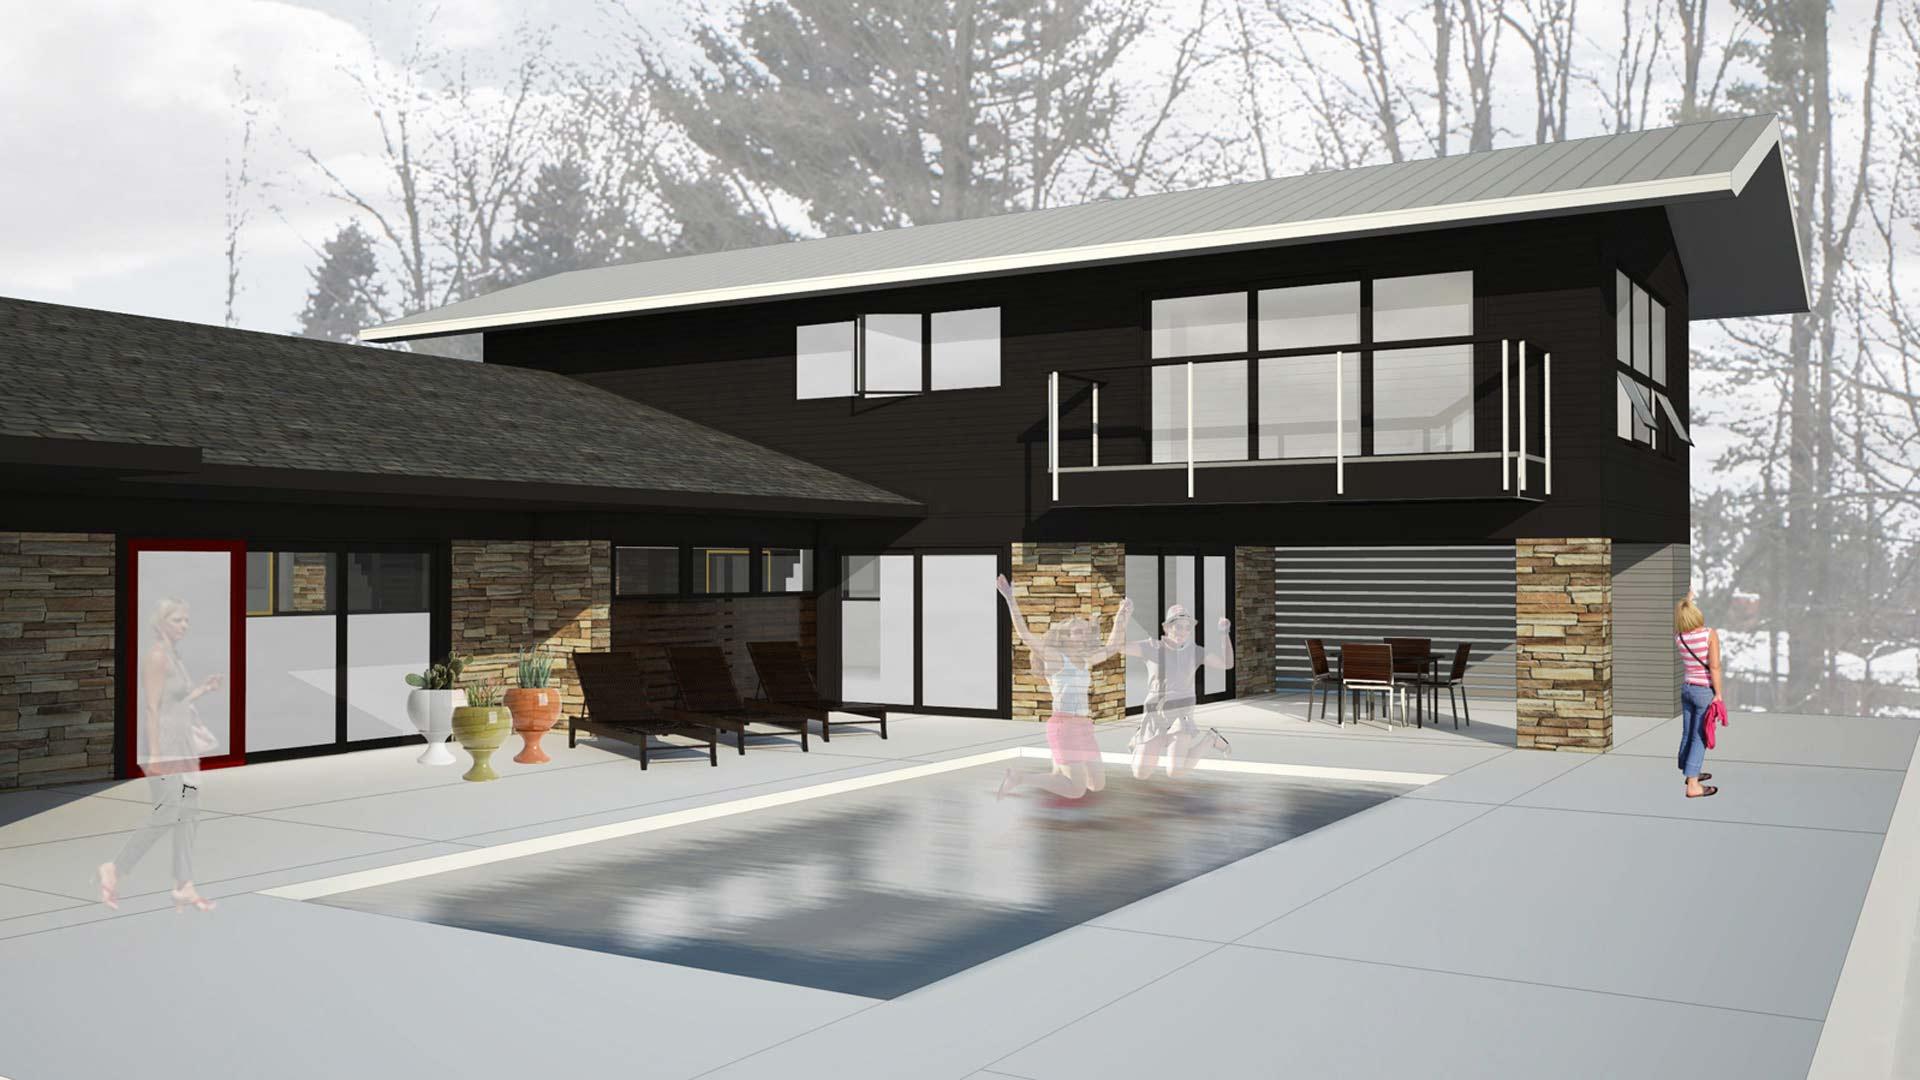 Midcentury Modern Renovation 3 - HAUS Architecture, Christopher Short, Indianapolis Architect